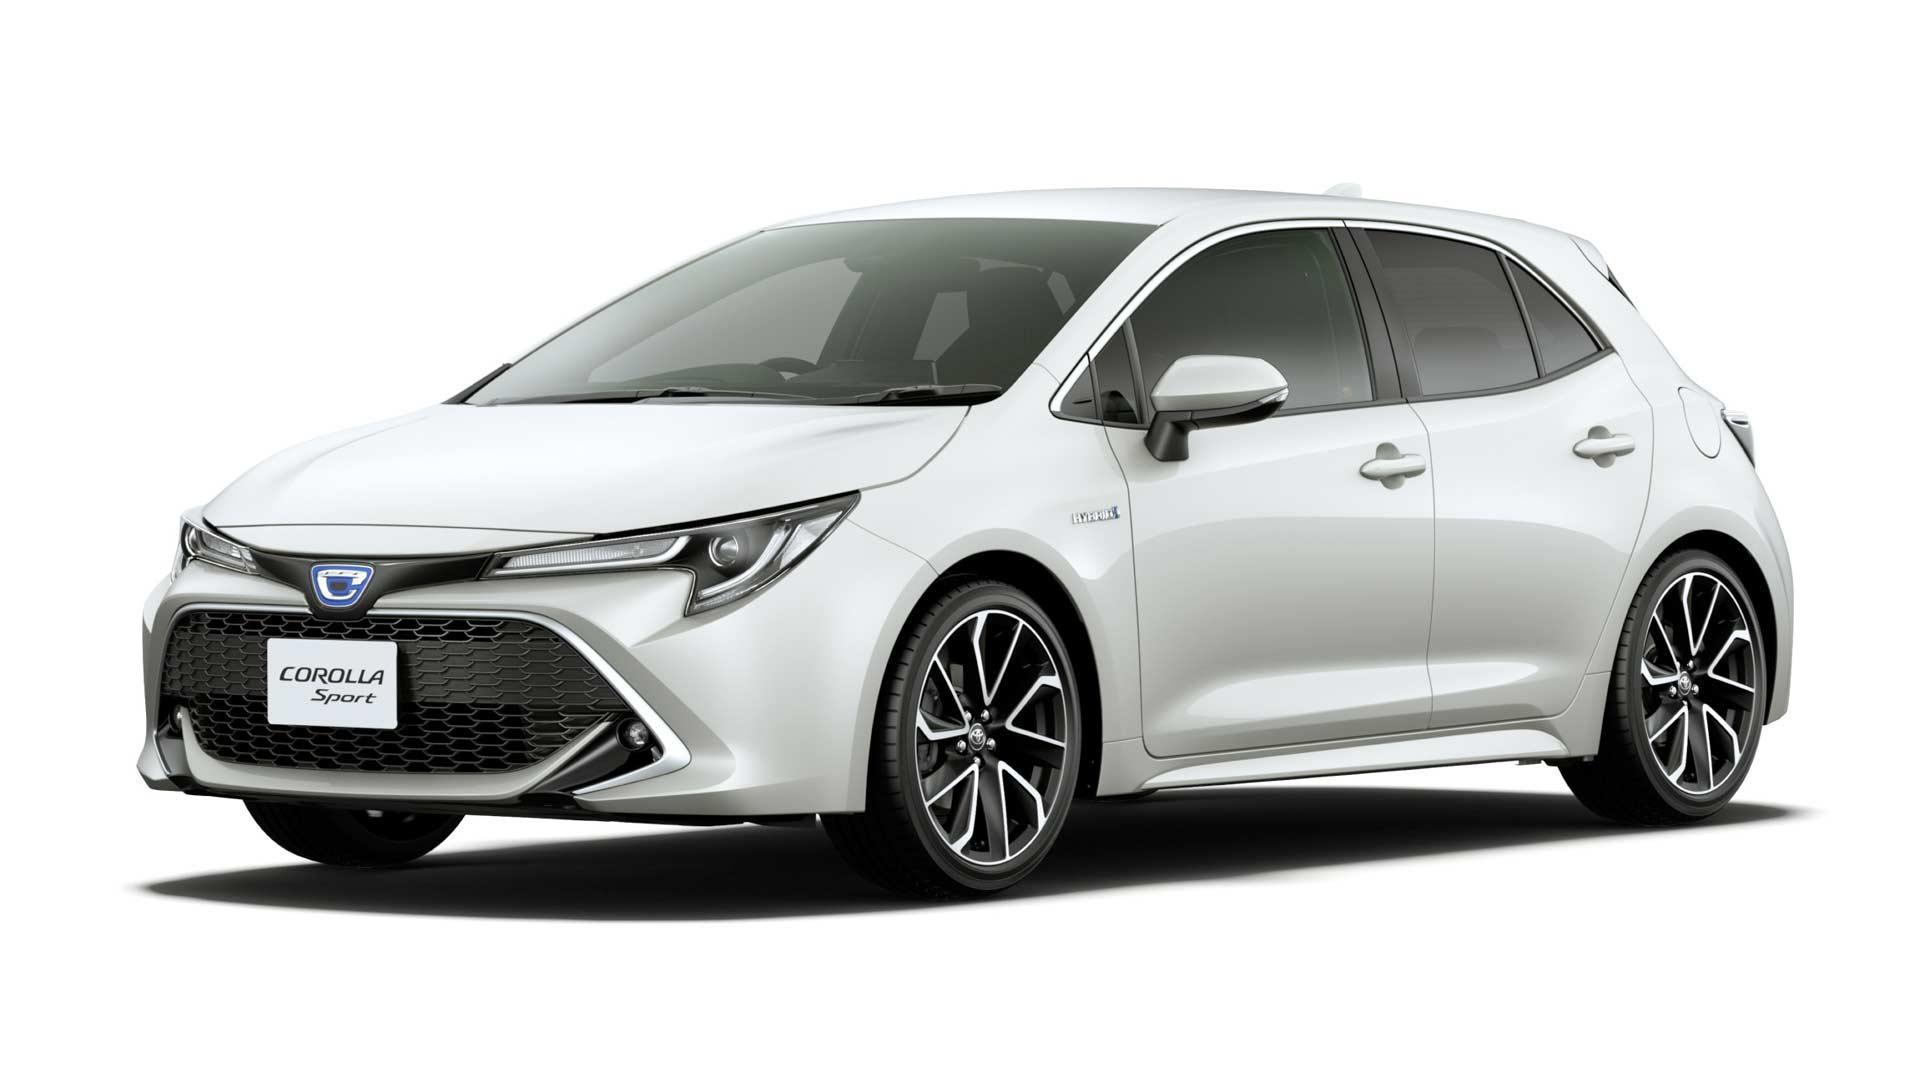 2018 Corolla Sport Hatchback